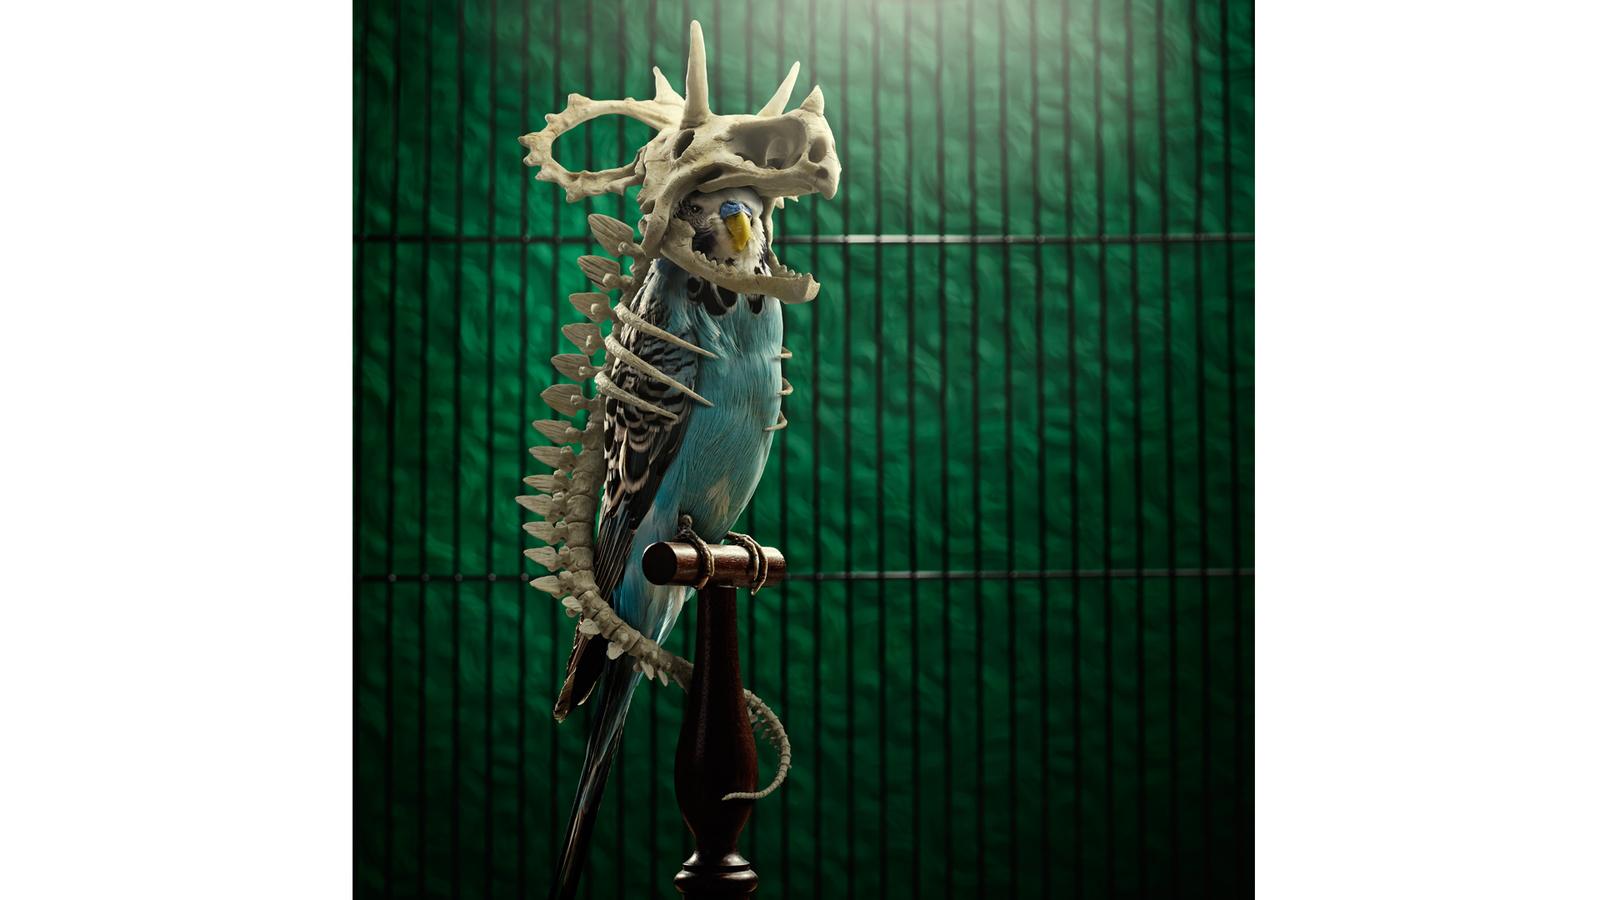 Full image of Dino Bird, photograph of budgie adorning a CG dinosaur skeleton